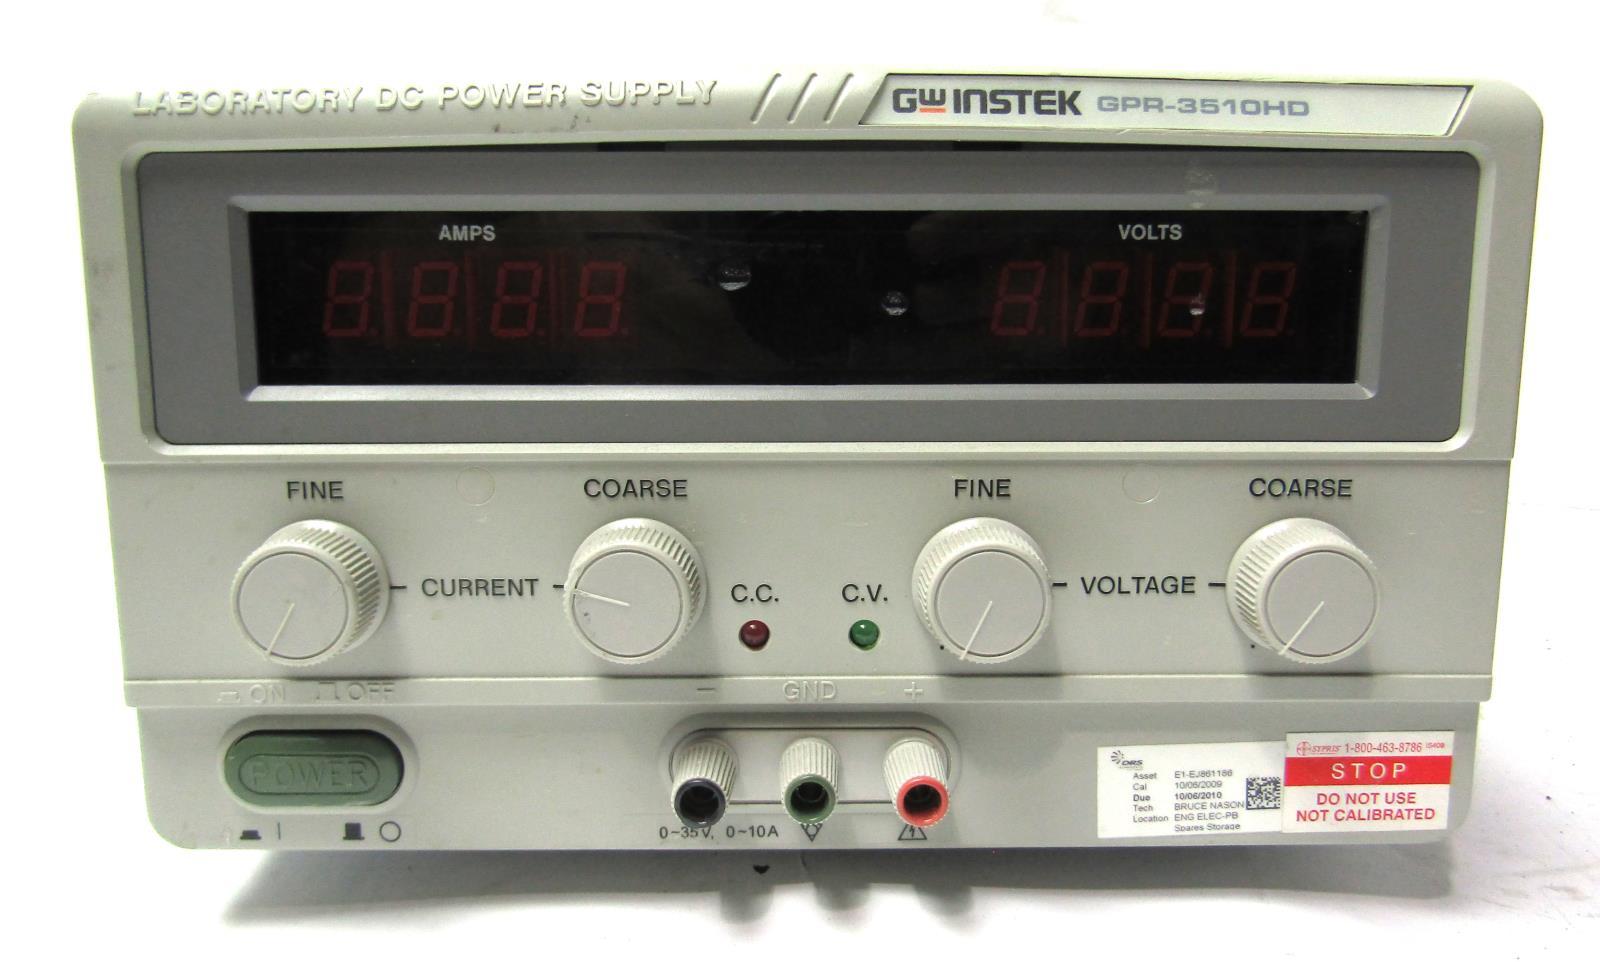 Gw Instek Gpr 3510hd Laboratory Dc Power Supply 3 1 2